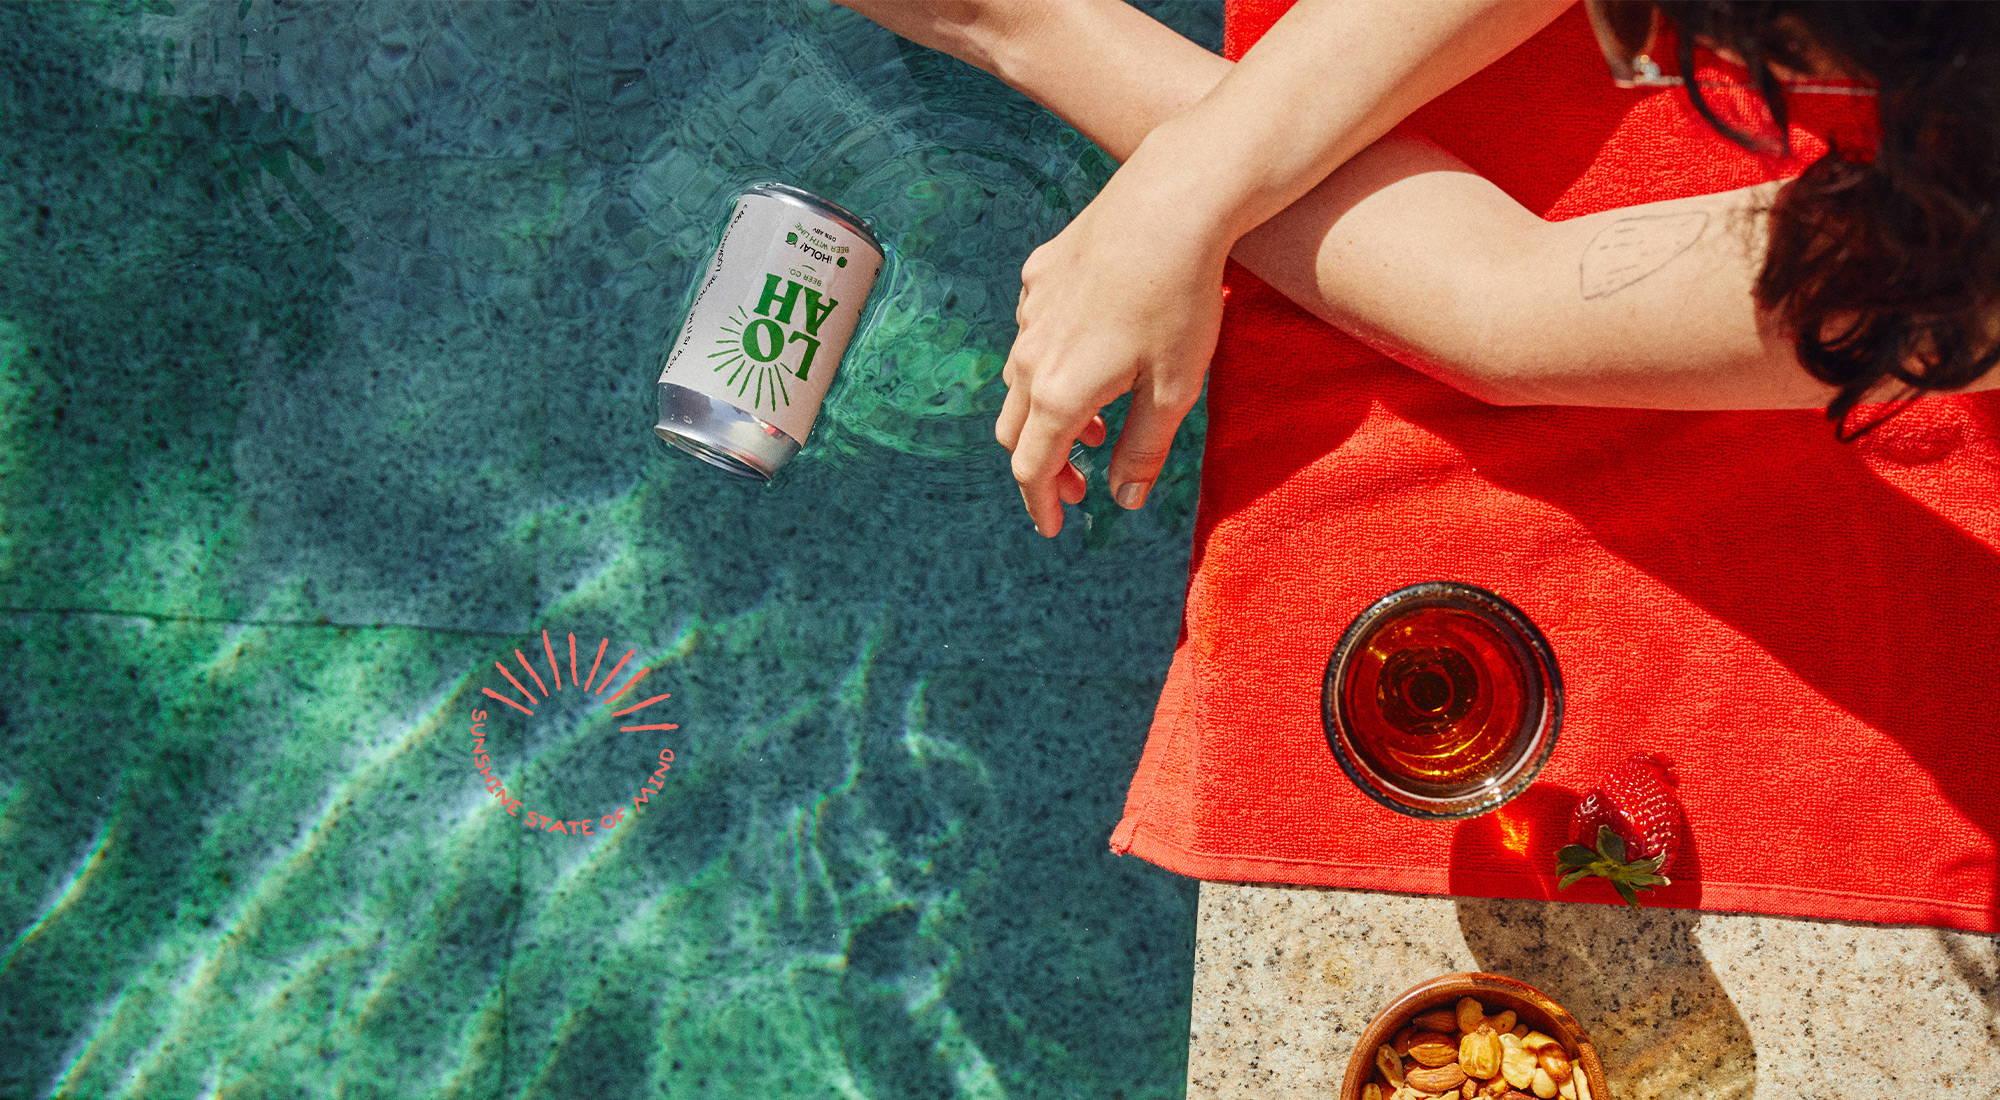 Loah Beer enjoyed poolside in the sunshine